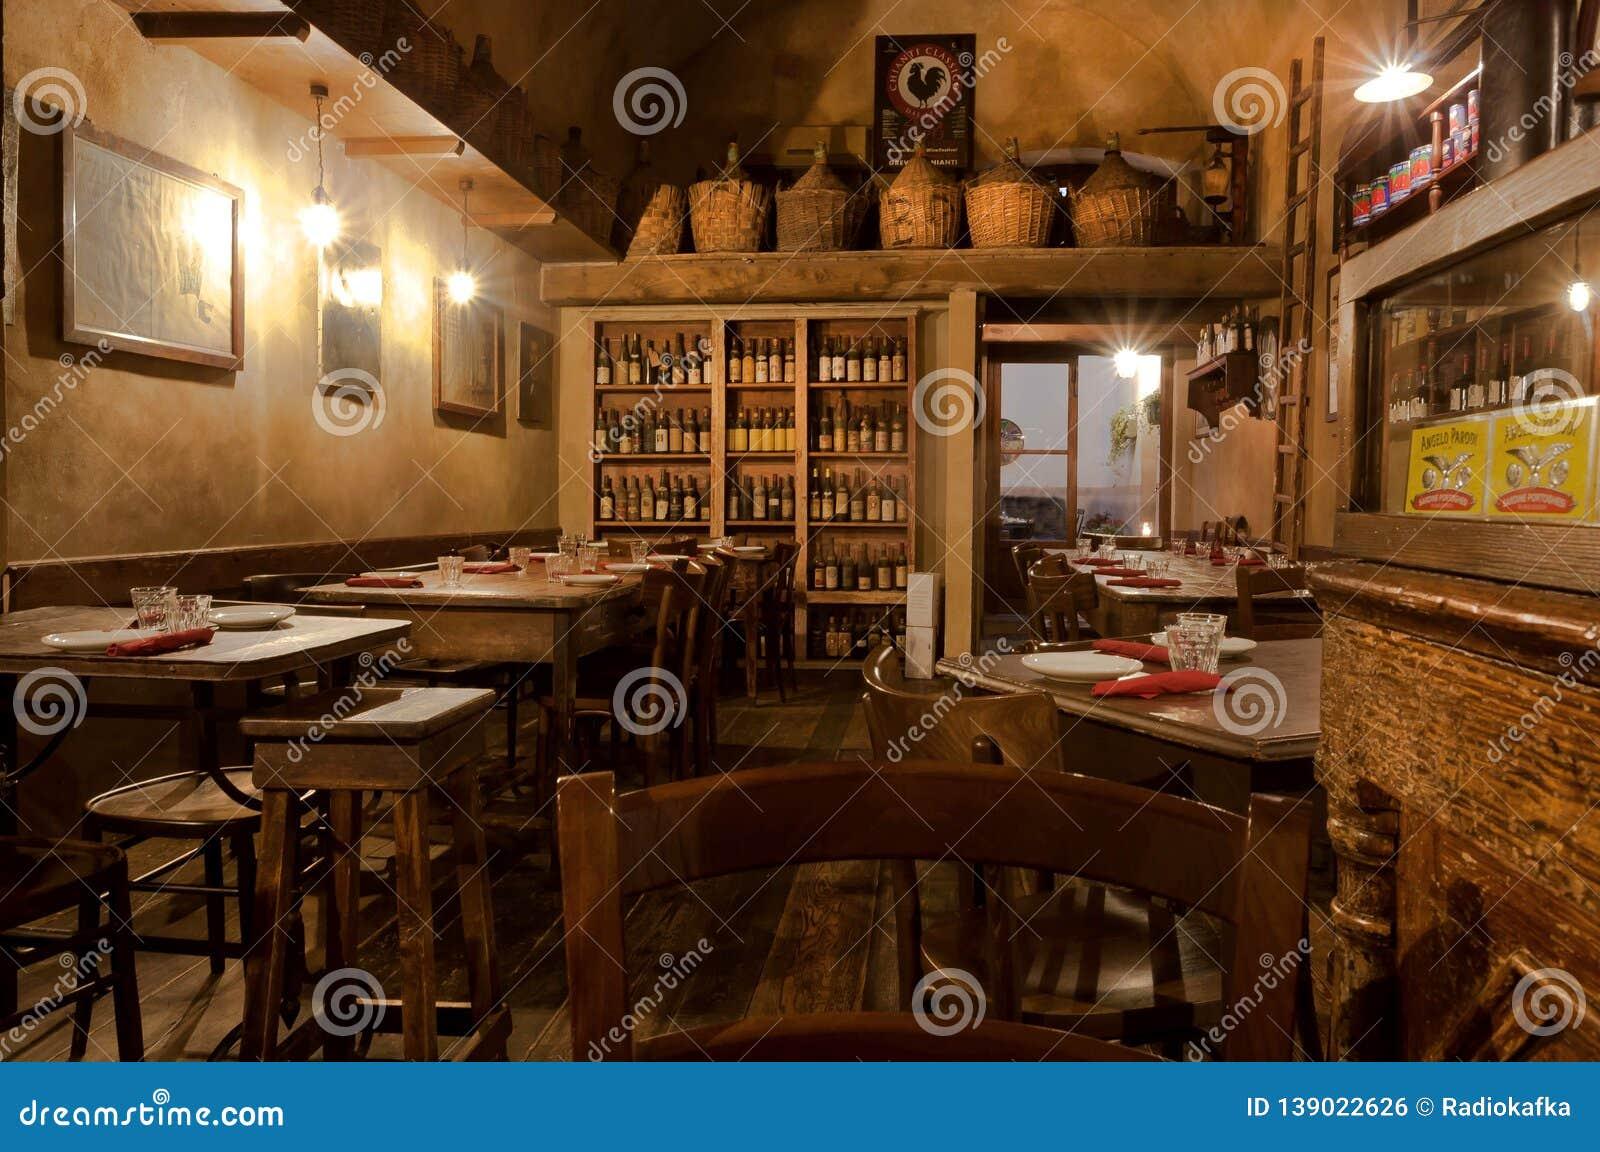 Wine Bottles And Wooden Vintage Furniture Inside Traditional Italian Restaurant Editorial Photo Image Of Dinner Restaurant 139022626